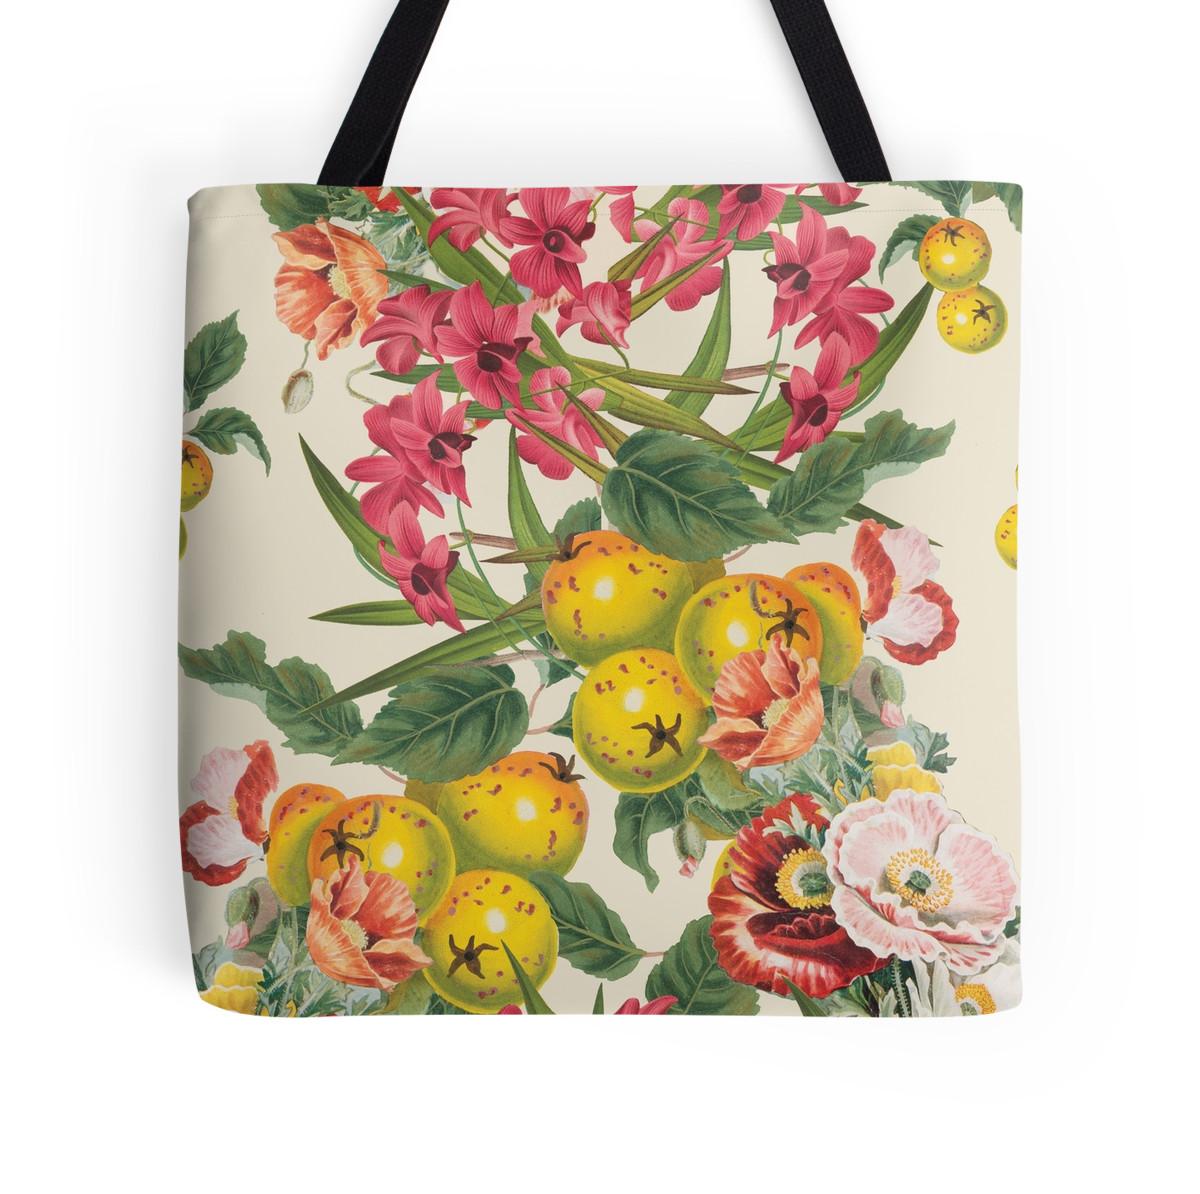 A bright floral print tote bag.